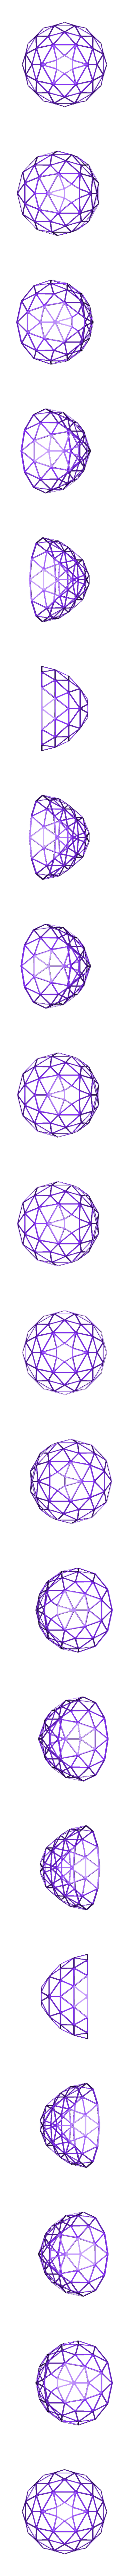 geodisc-220-a.stl Download free STL file Geodesic Lamp Shade • 3D printer design, Adafruit